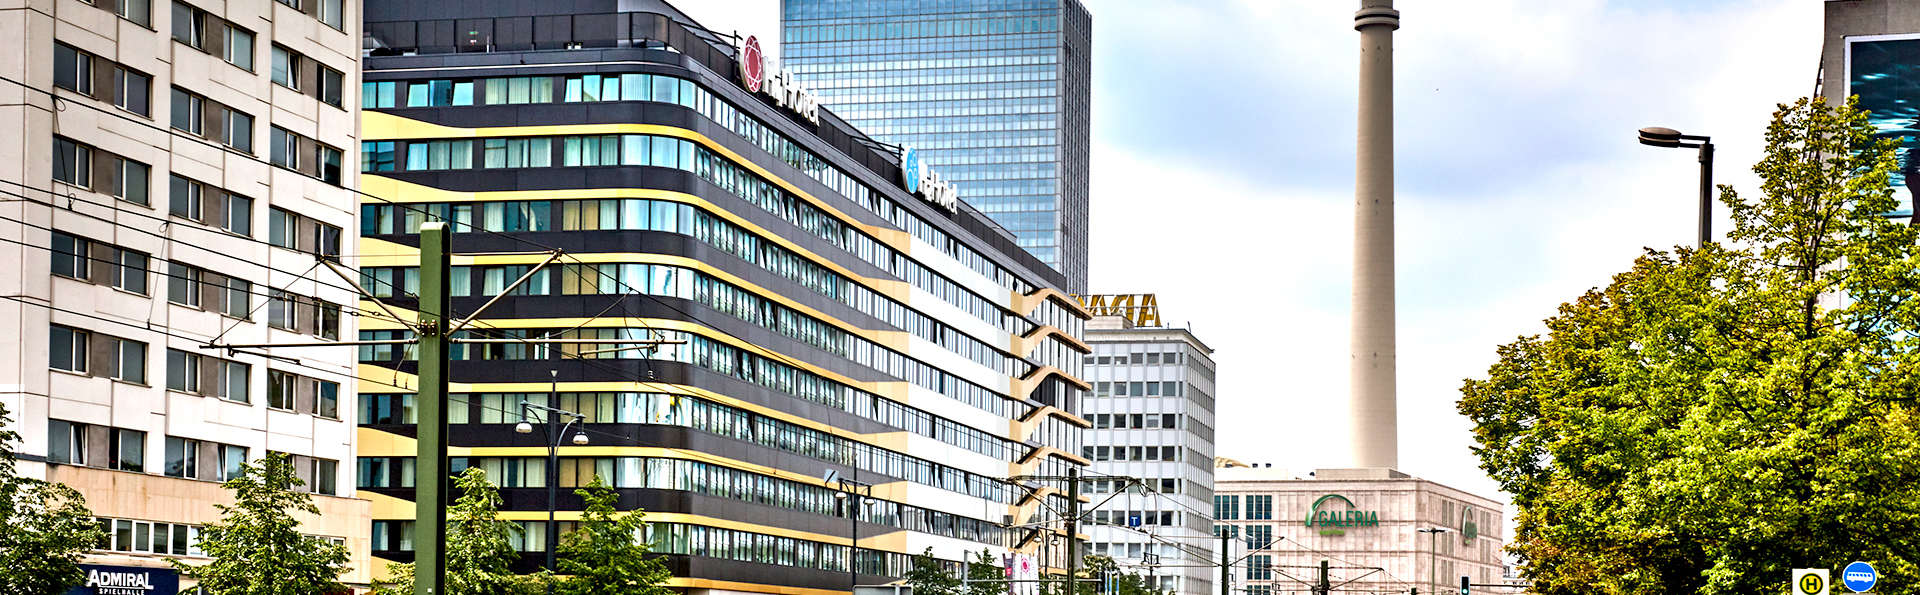 H4 Hotel Berlin Alexanderplatz - Edit_Front3.jpg